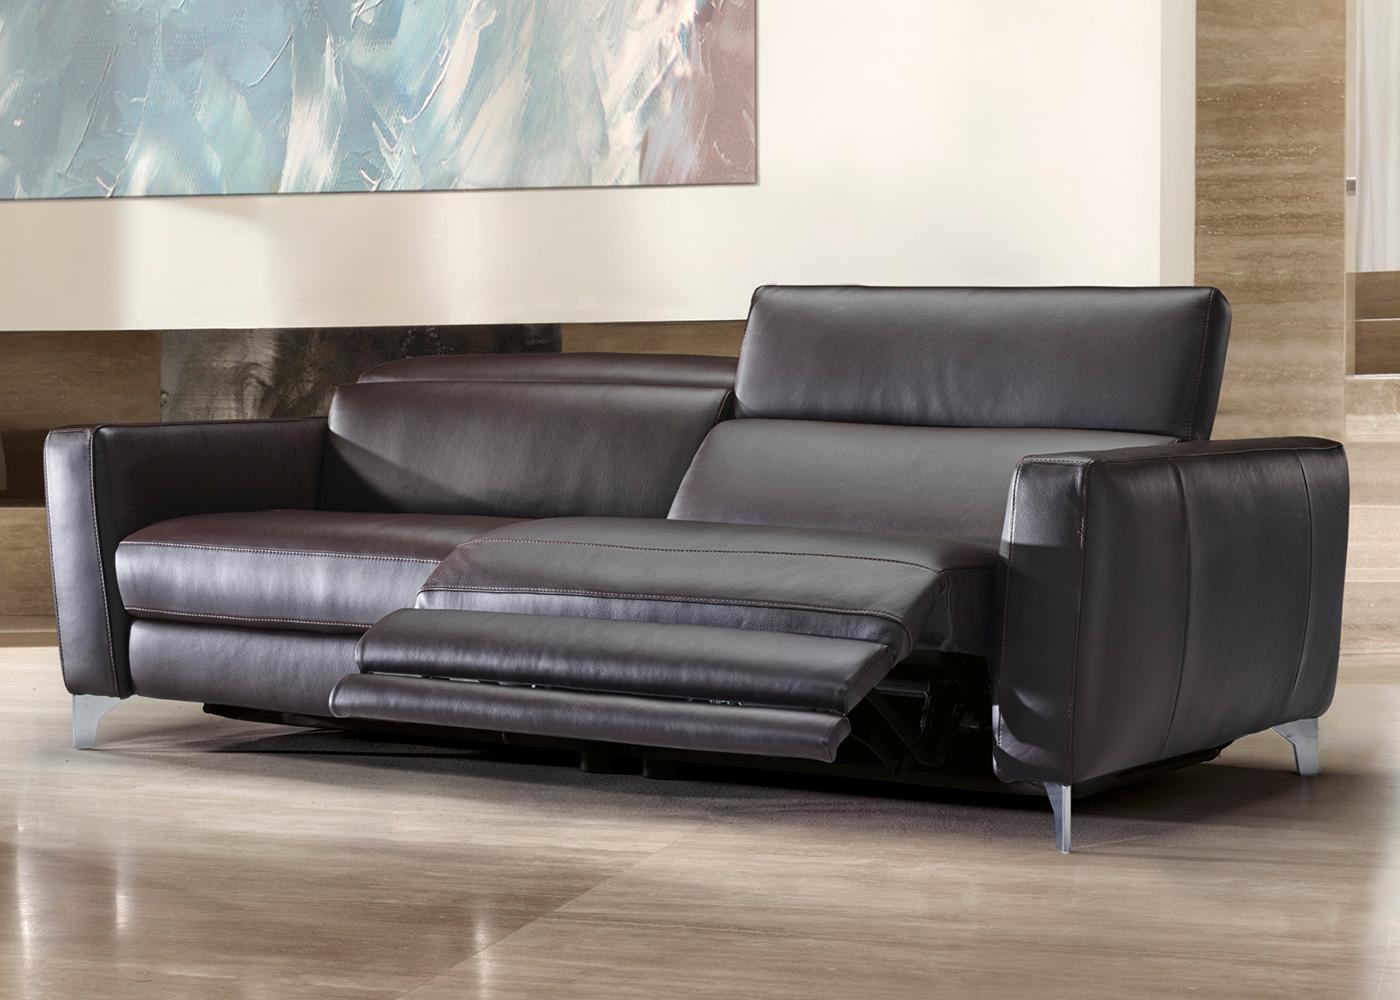 Natuzzi Volo Sofa Midfurn Furniture Superstore